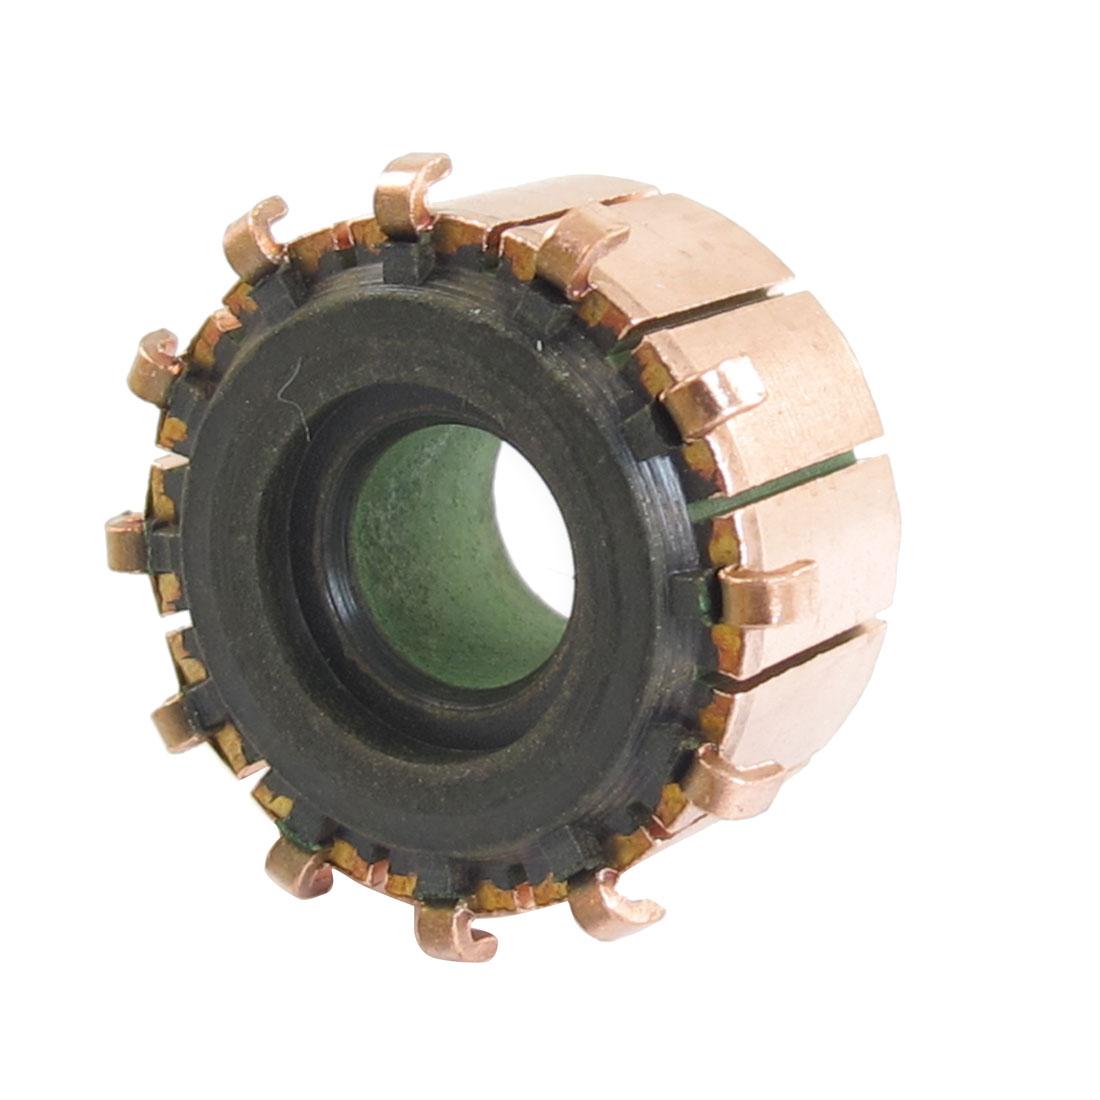 8.1mm x 21.5mm x 12mm 12P Copper Bars Armature Commutator for Starter Motor